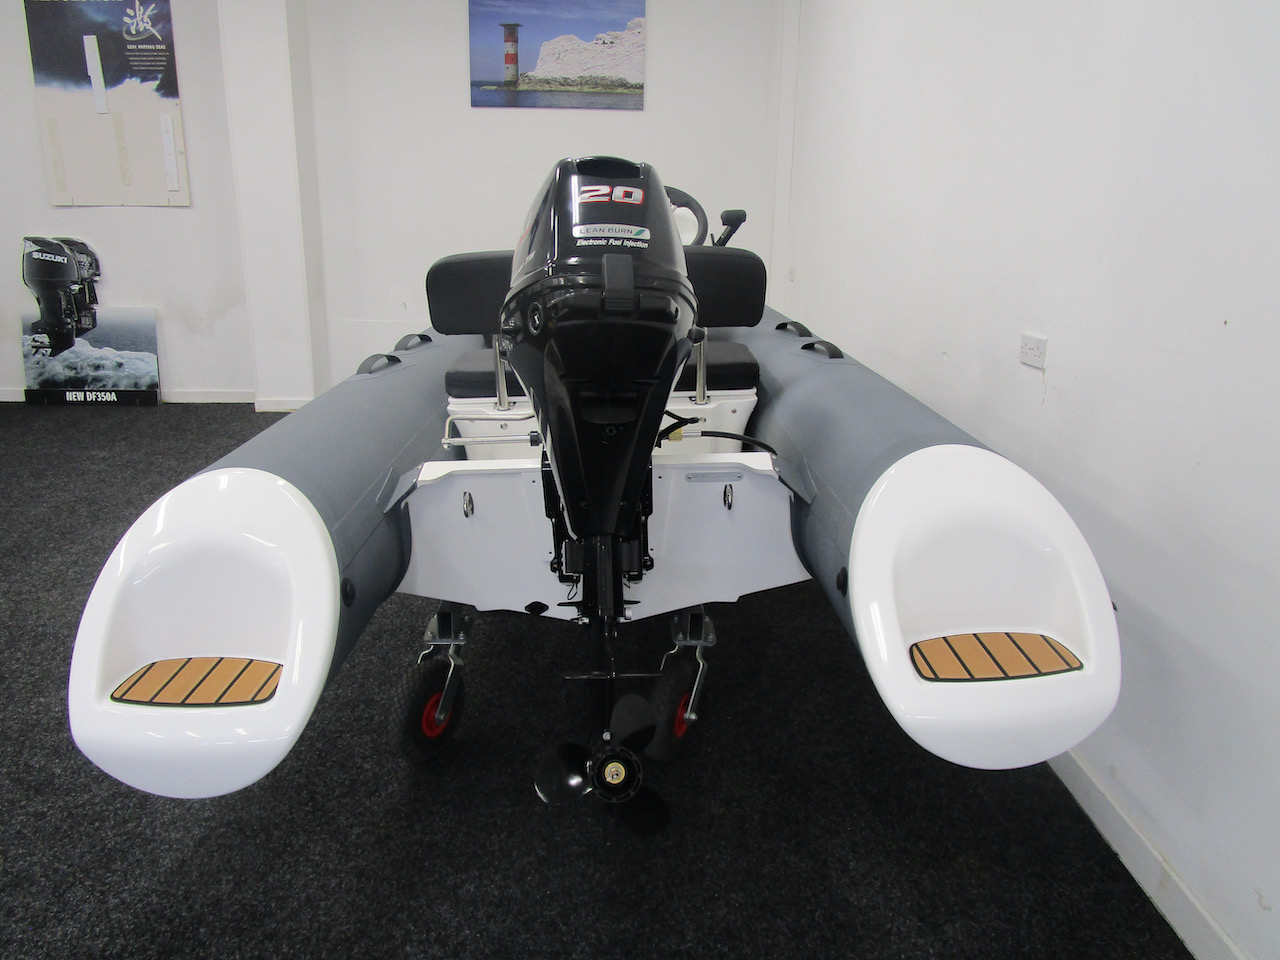 GRAND S330 RIB tender stern view